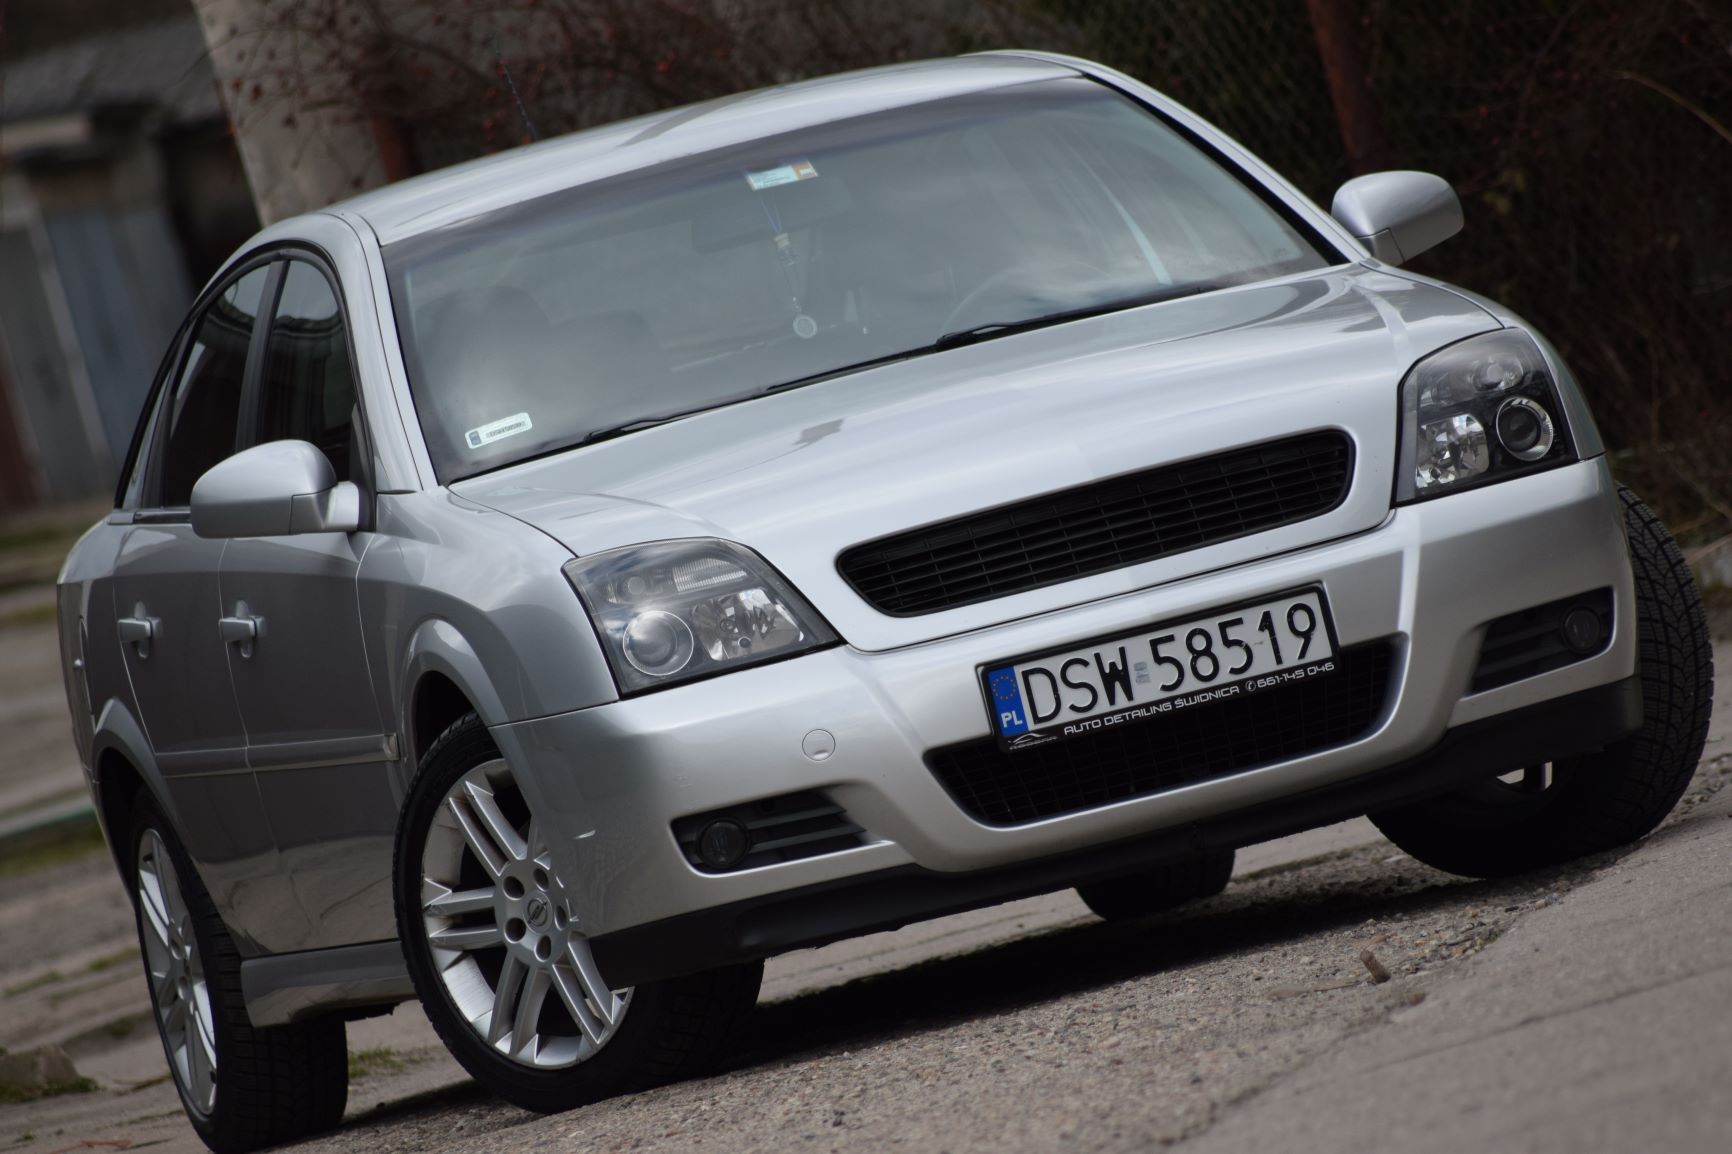 Opel Vectra C GTS 1.8 benzyna. Unikat!